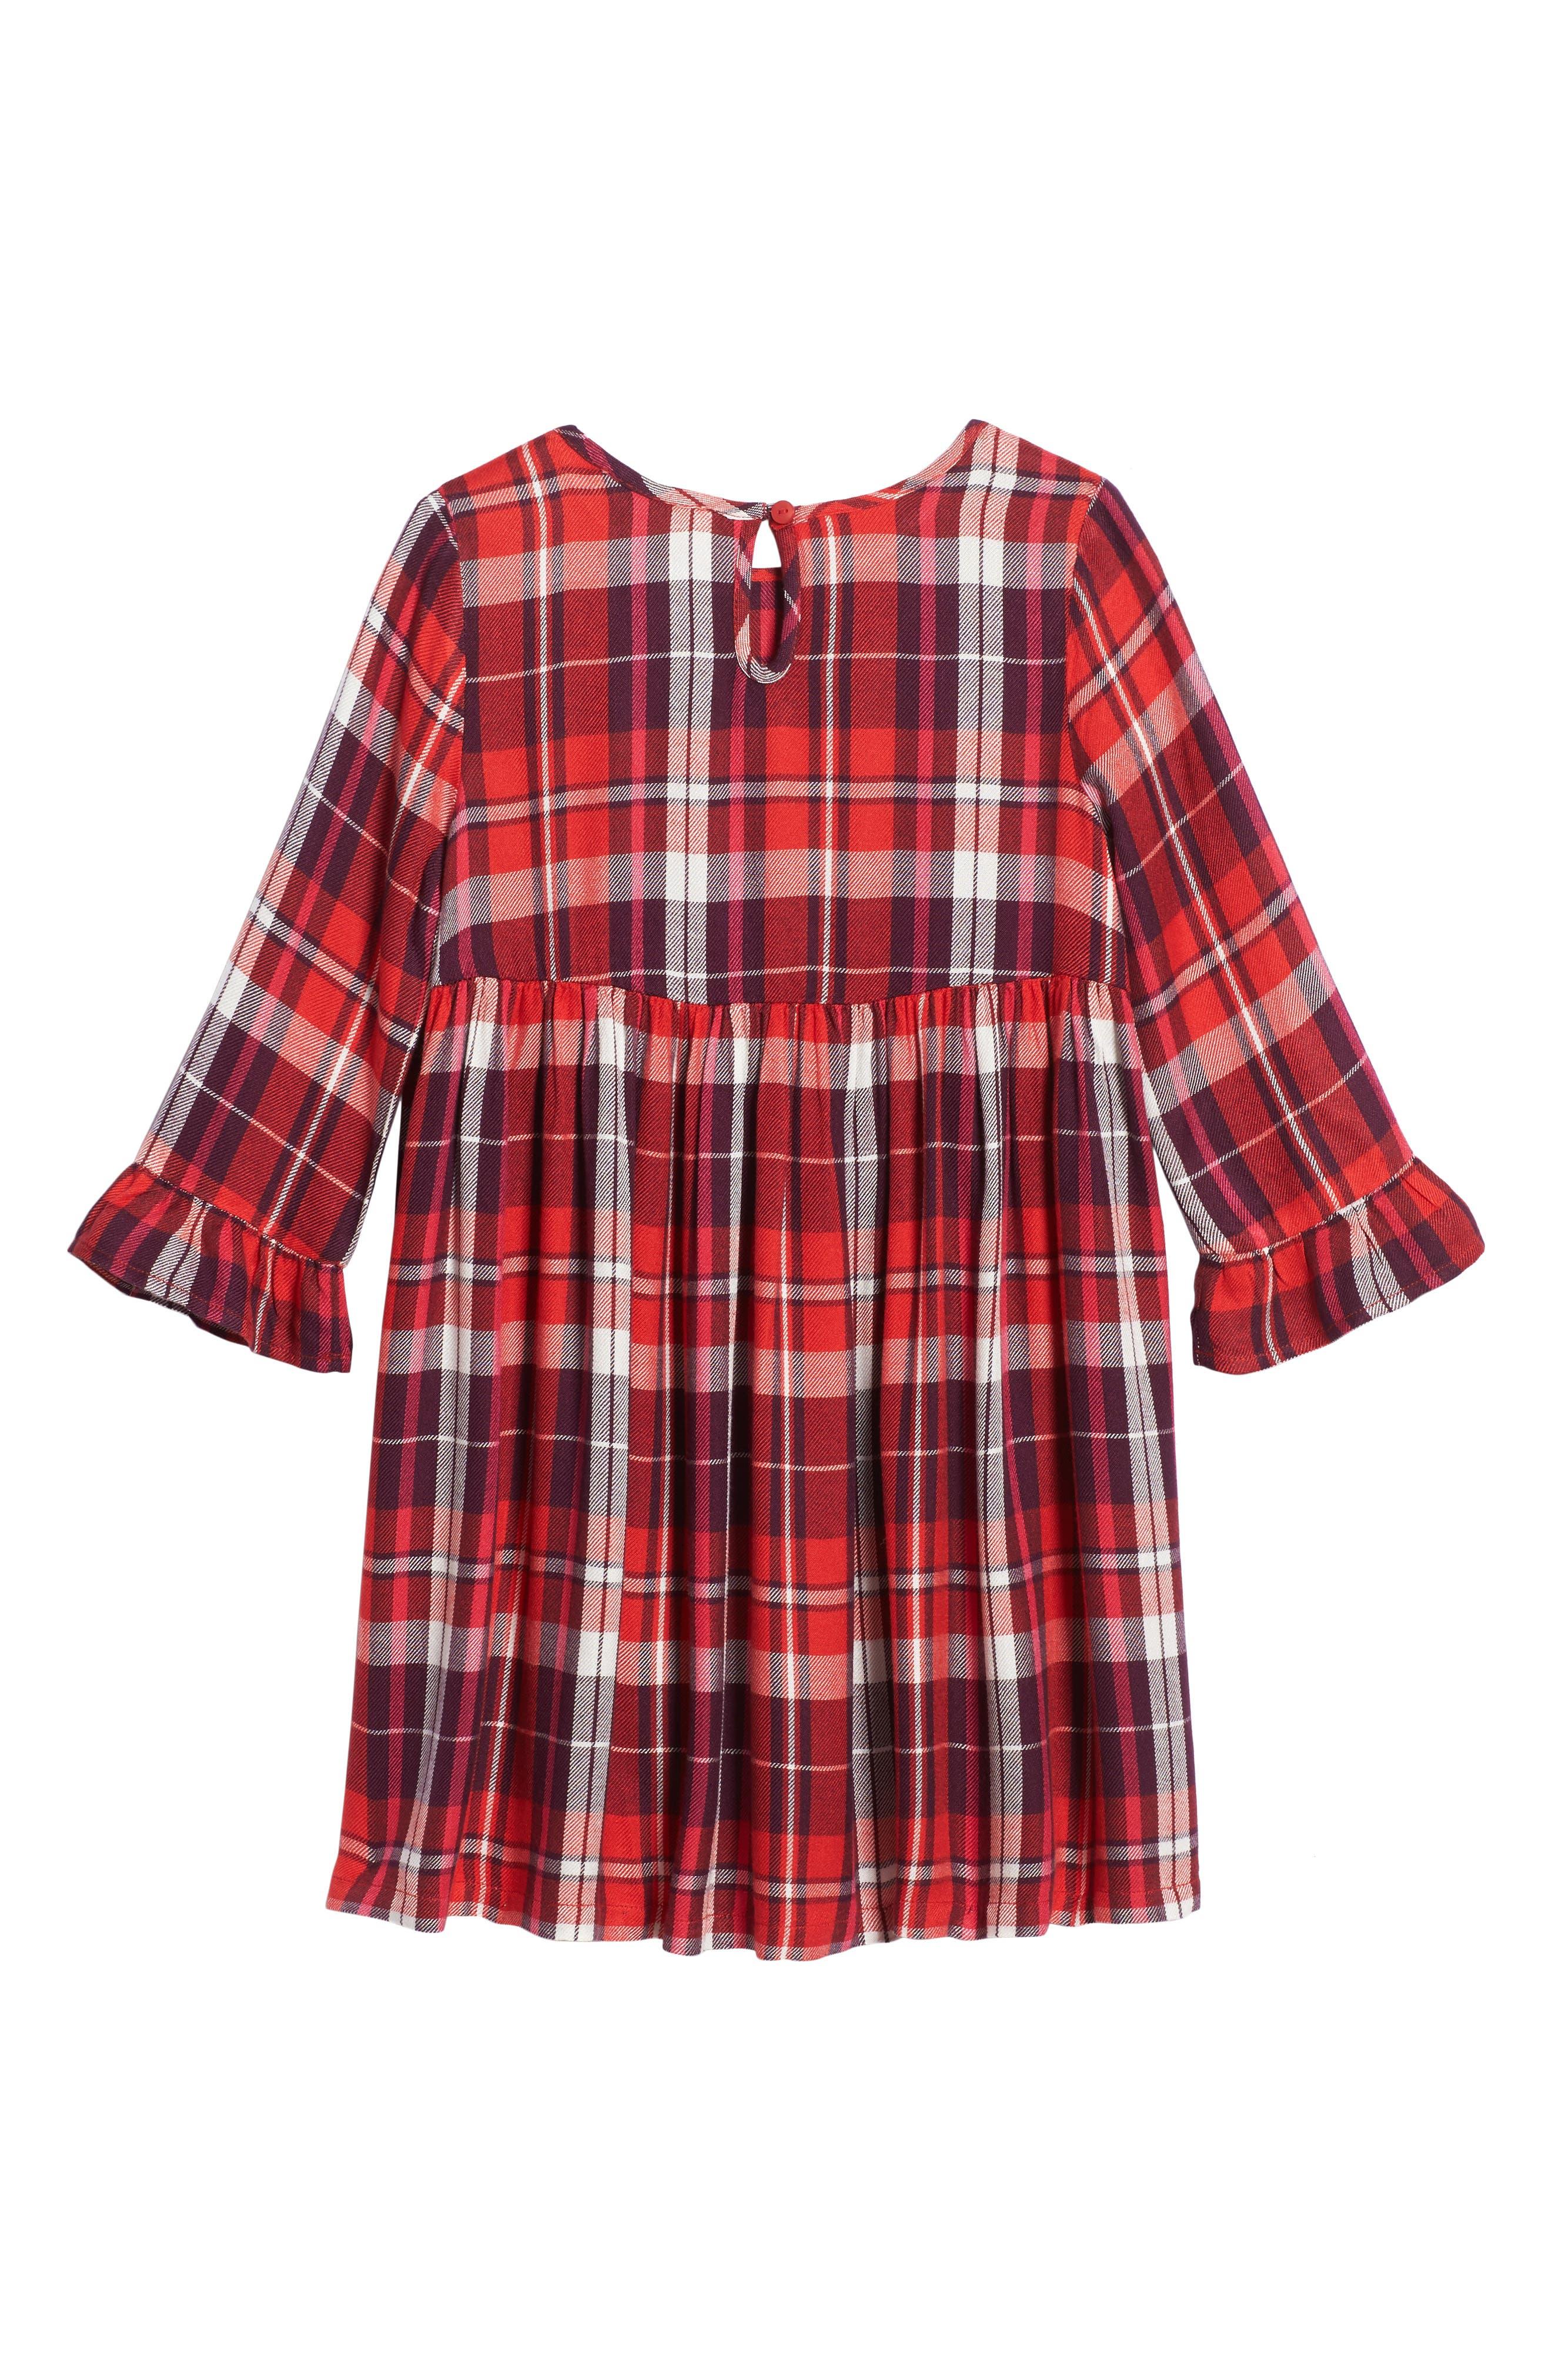 Plaid Flutter Sleeve Dress,                             Alternate thumbnail 2, color,                             610